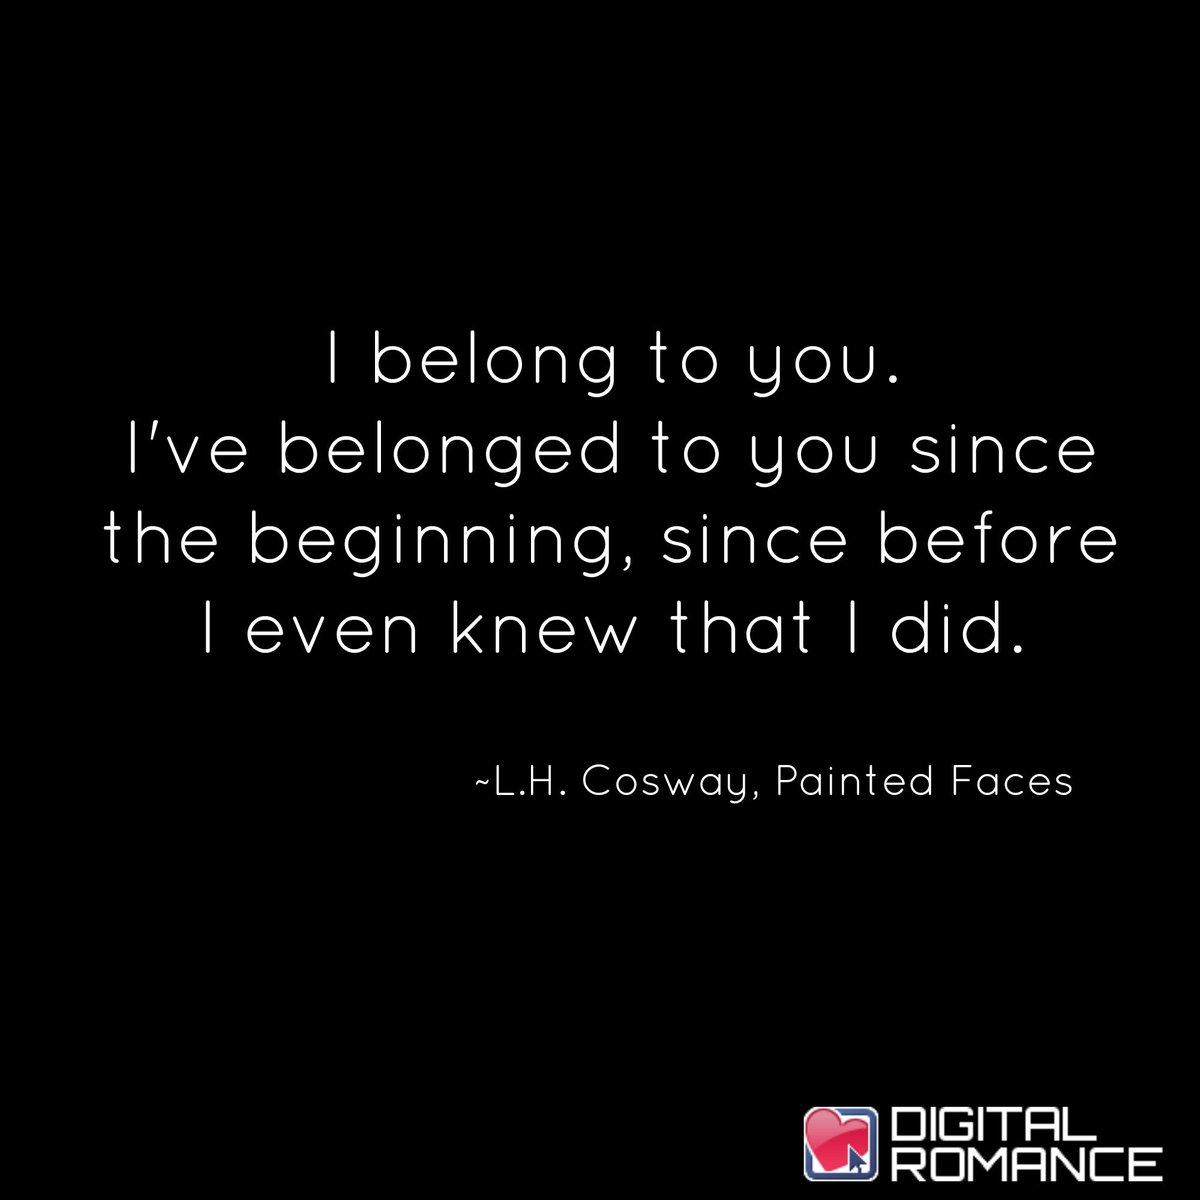 Digital Romance Inc On Twitter I Belong To You Ive Belonged To